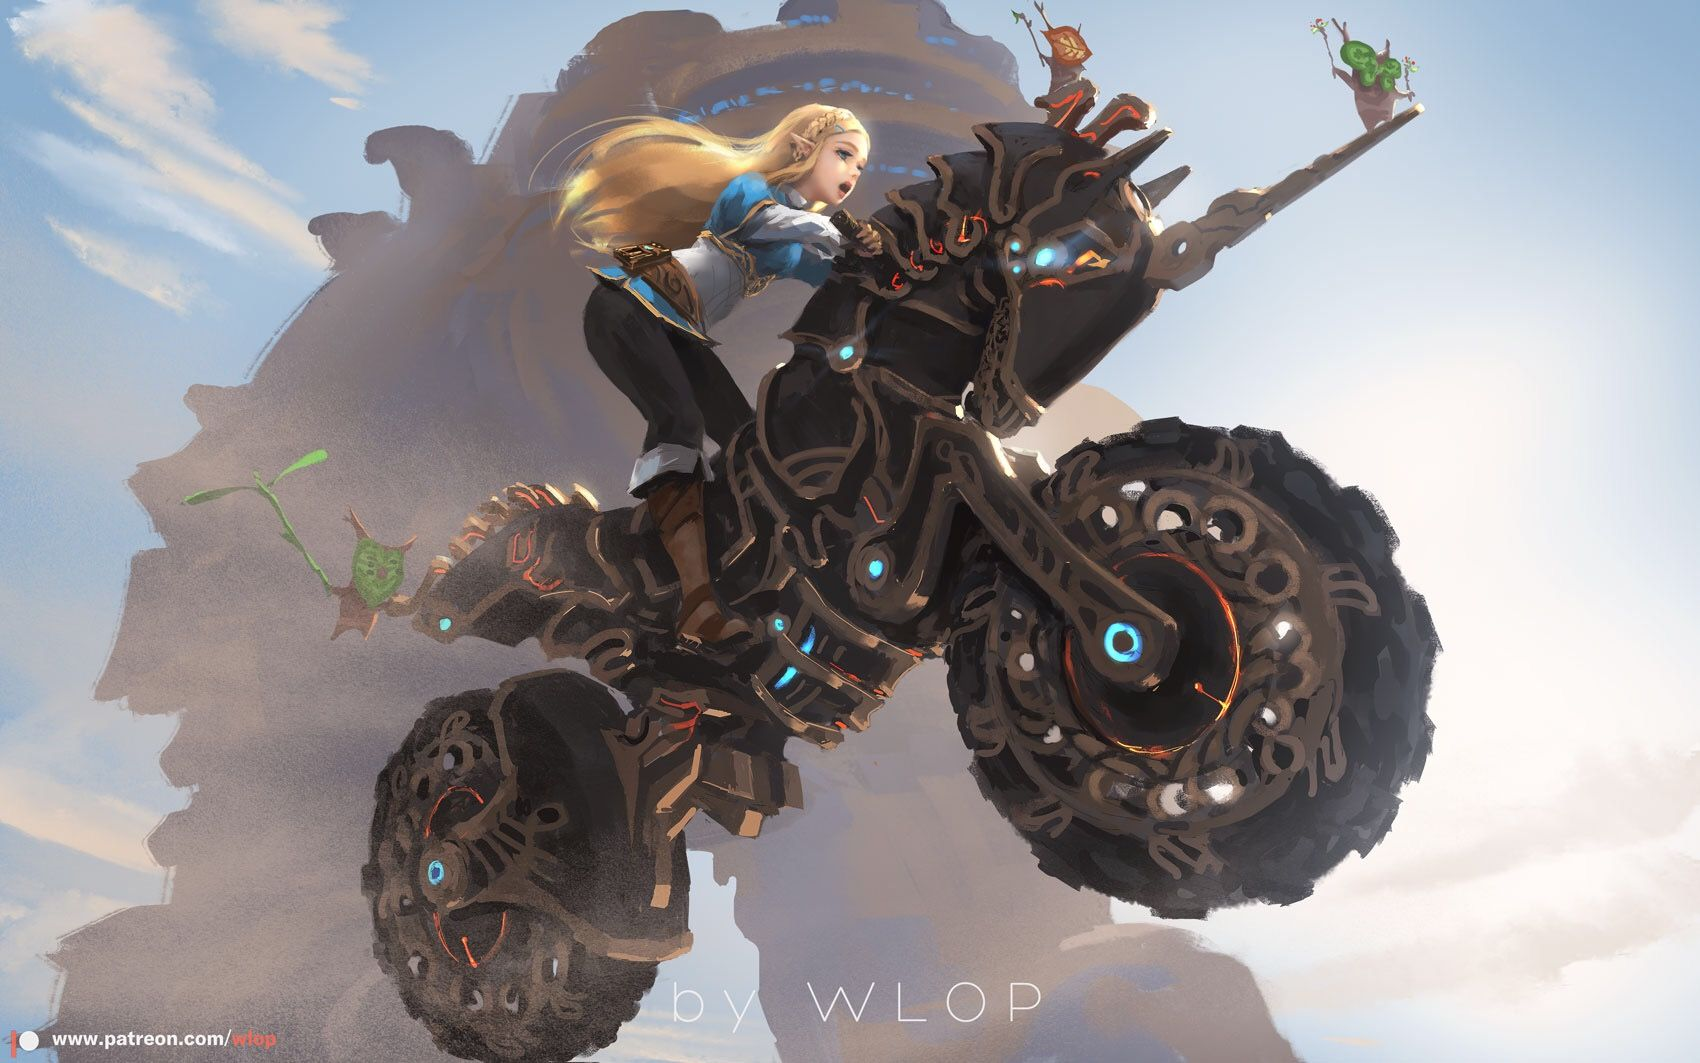 Zelda Breath Of The Wild Master Cycle: The Legend Of Zelda: Breath Of The